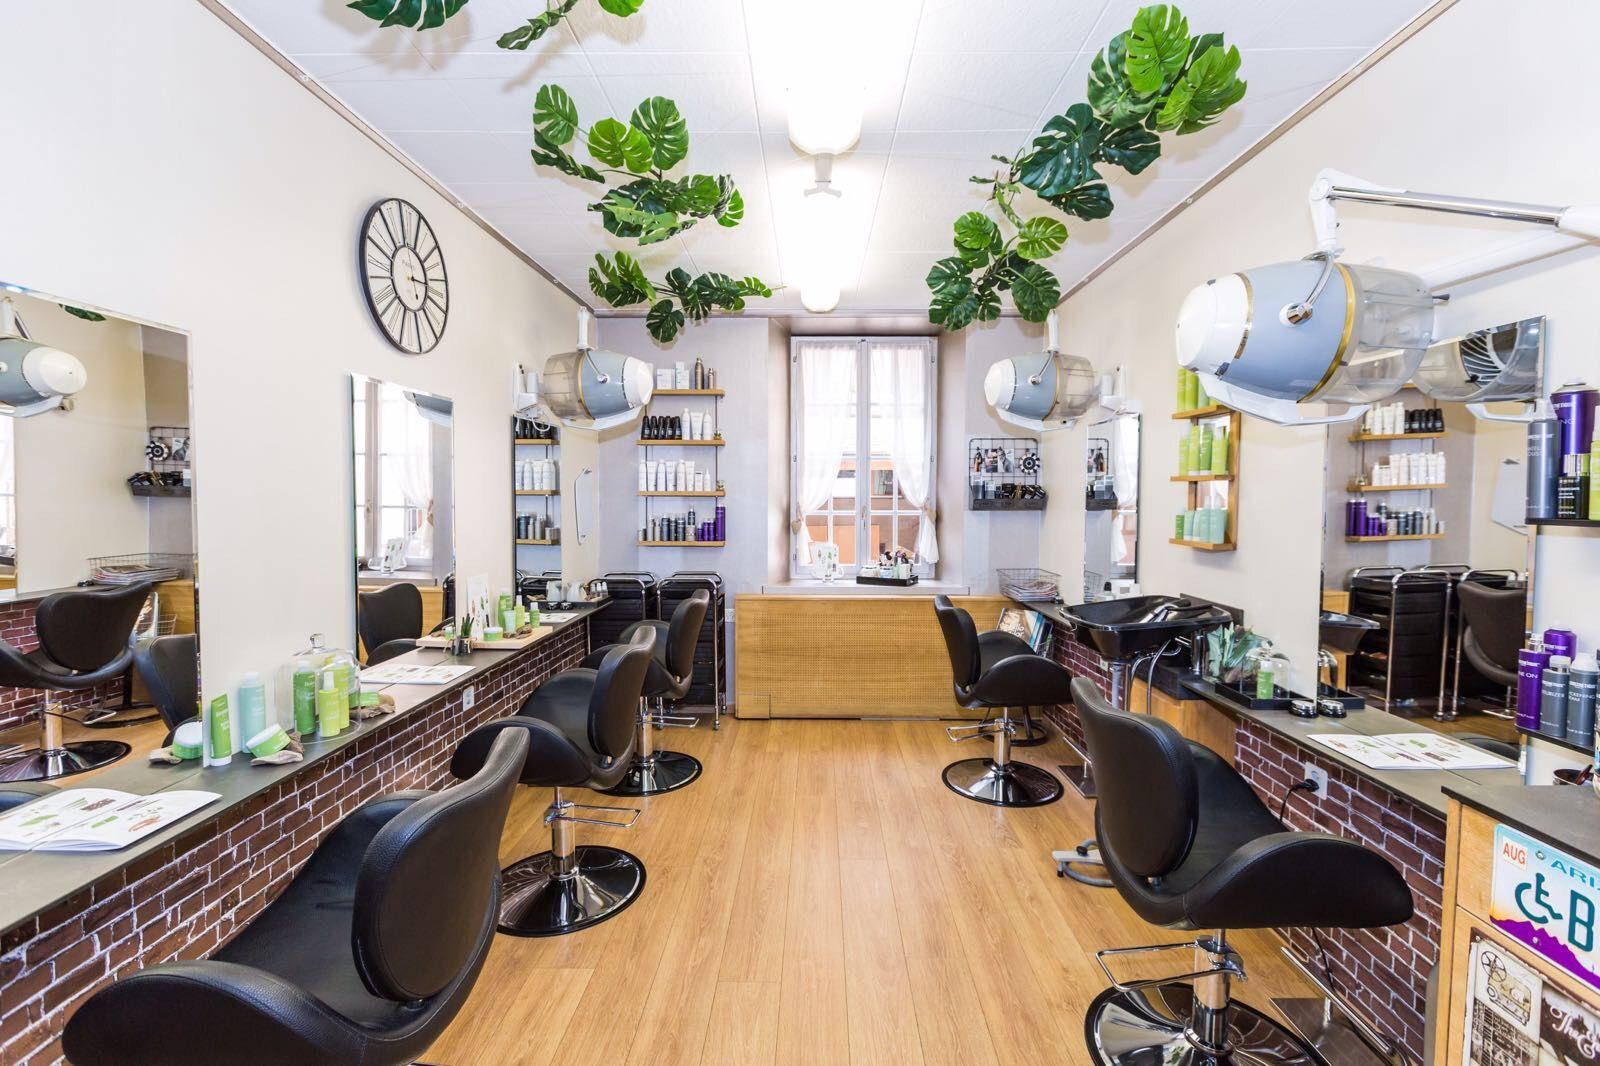 Salon De Coiffure Suisse Nature J P Coiffure Martigny